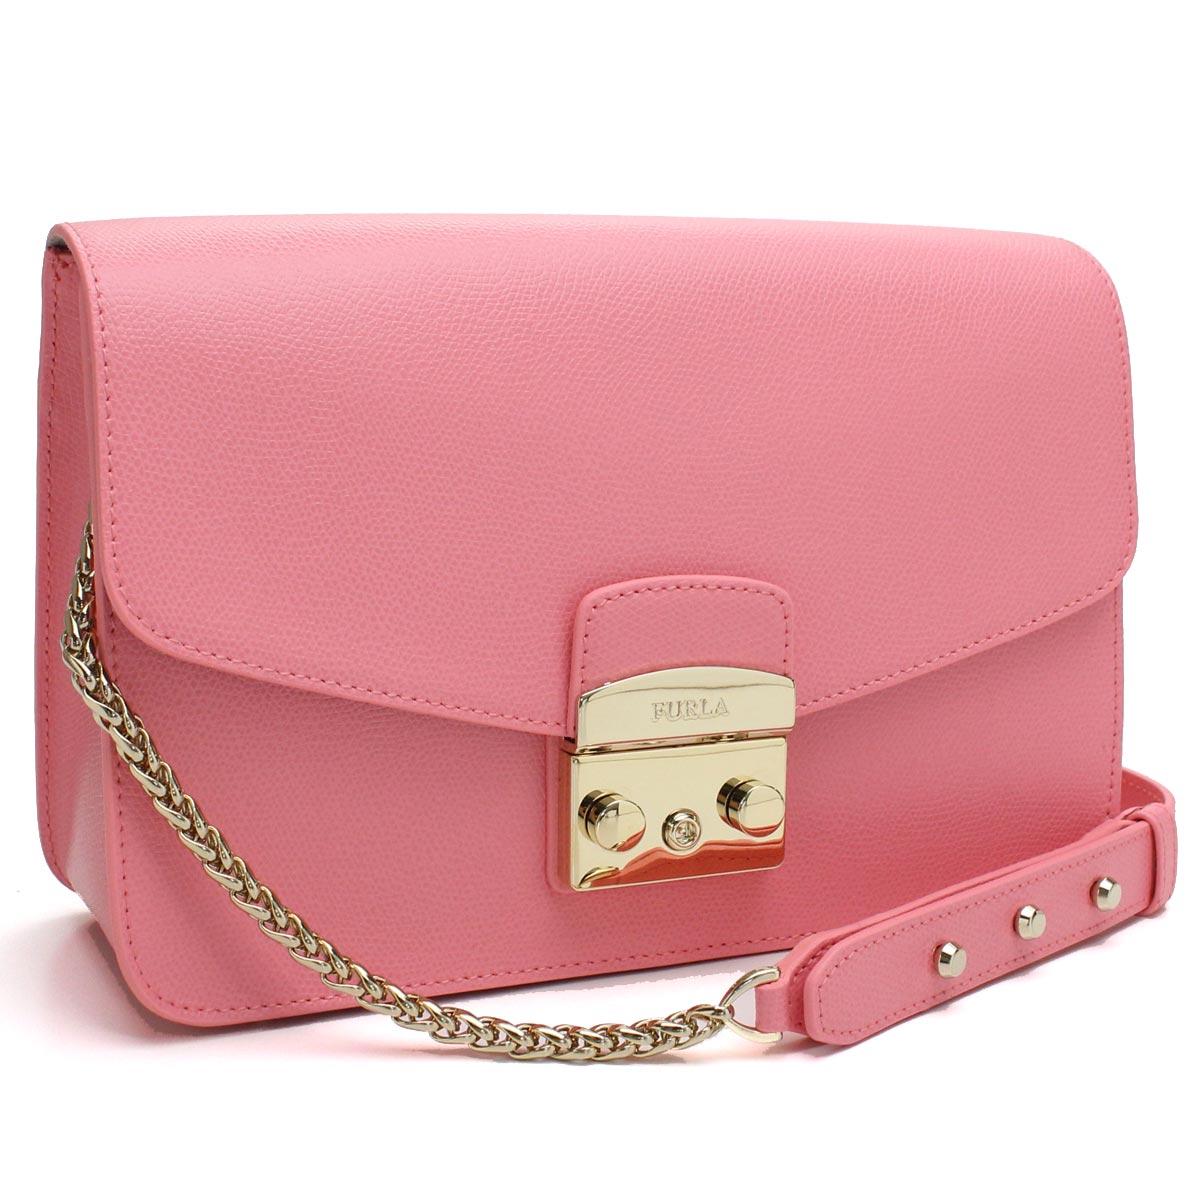 810d80f4cfce フルラ FURLA METROPOLIS metropolis chain shoulder bag BHV7 920375 ARE QRT ROSA  QUARZO pink system